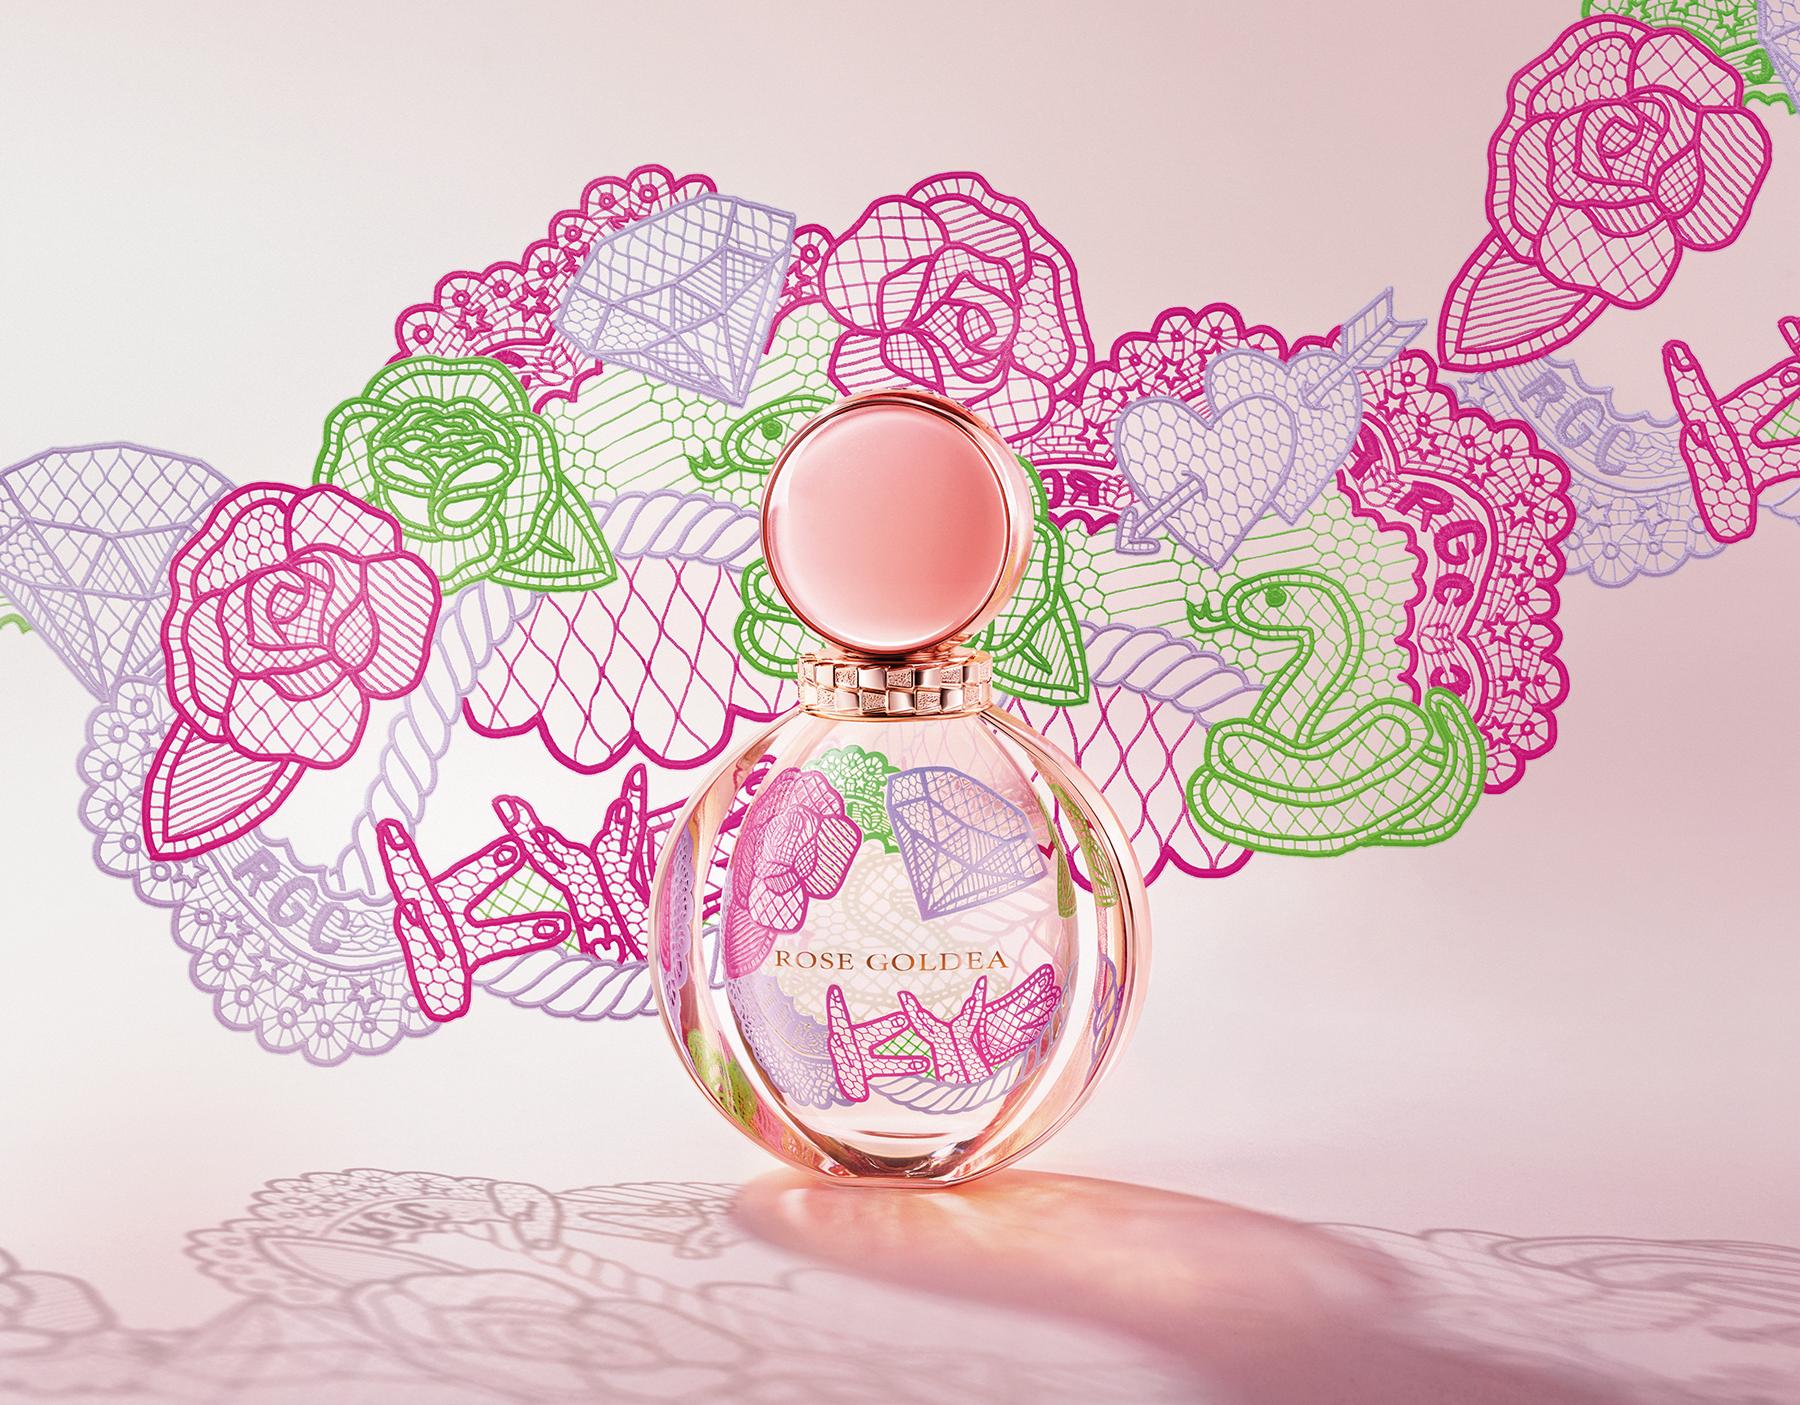 A new Limited Edition in collaboration with a Korean artist, Kathleen Kye, encapsulating the original Rose Goldea Eau de Parfum. 41150 image 6